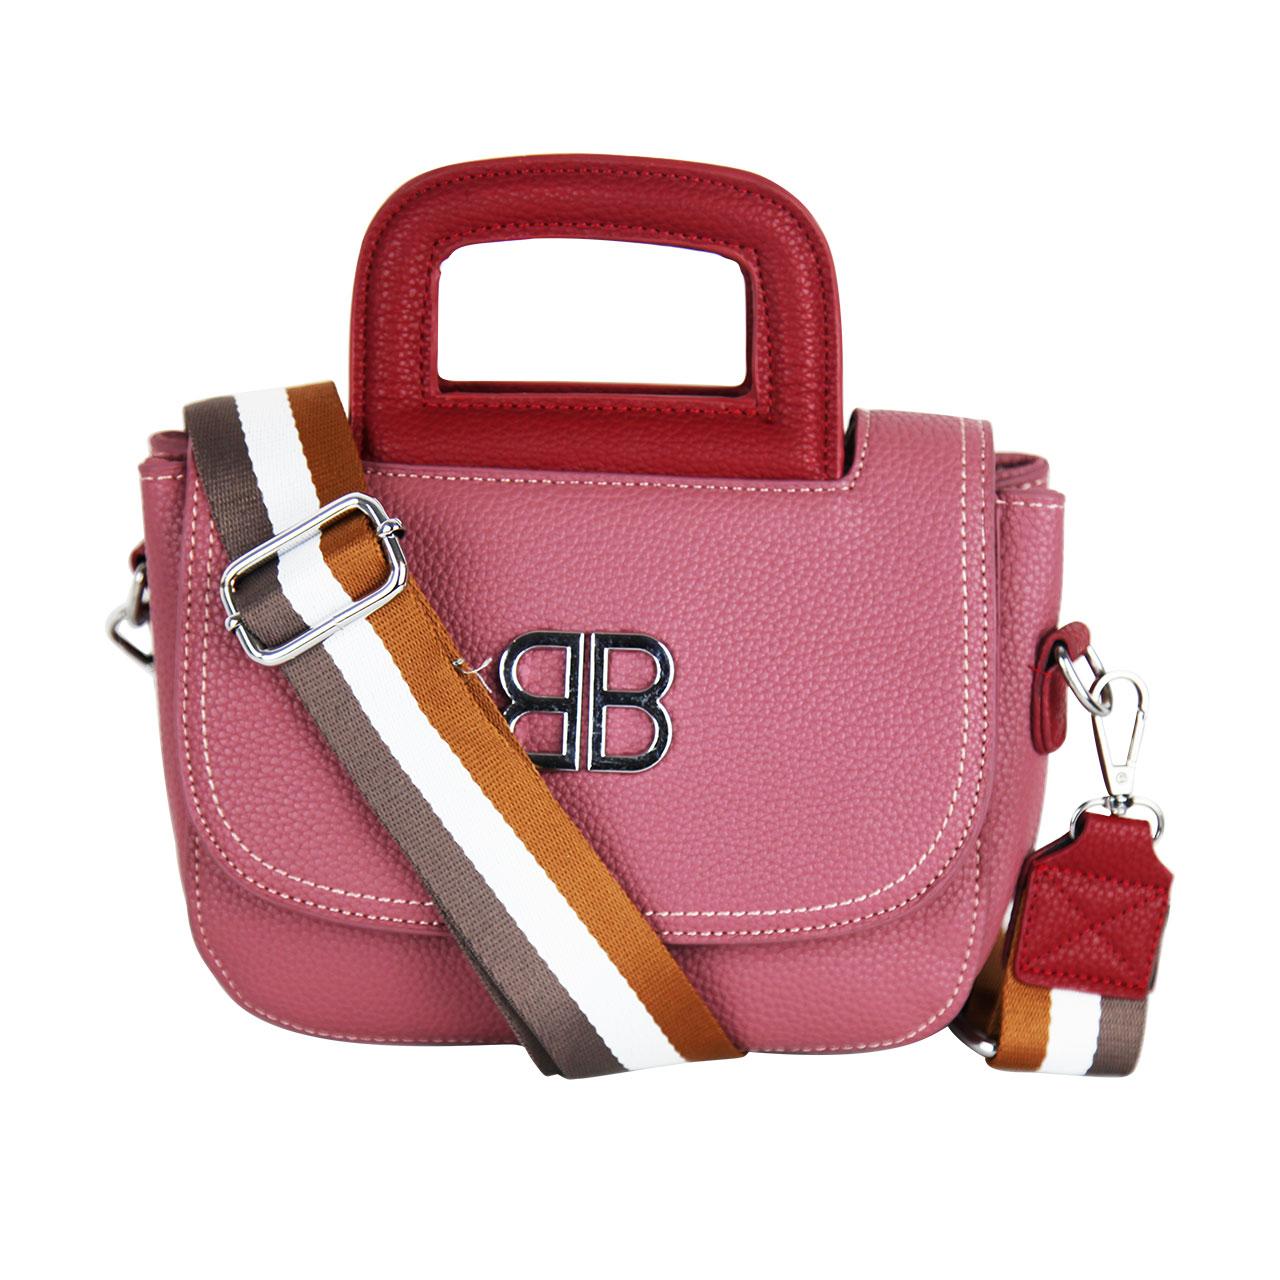 Cambridge Satchel Grey/ Ash Pink/ Orange/ Red Women's Bag